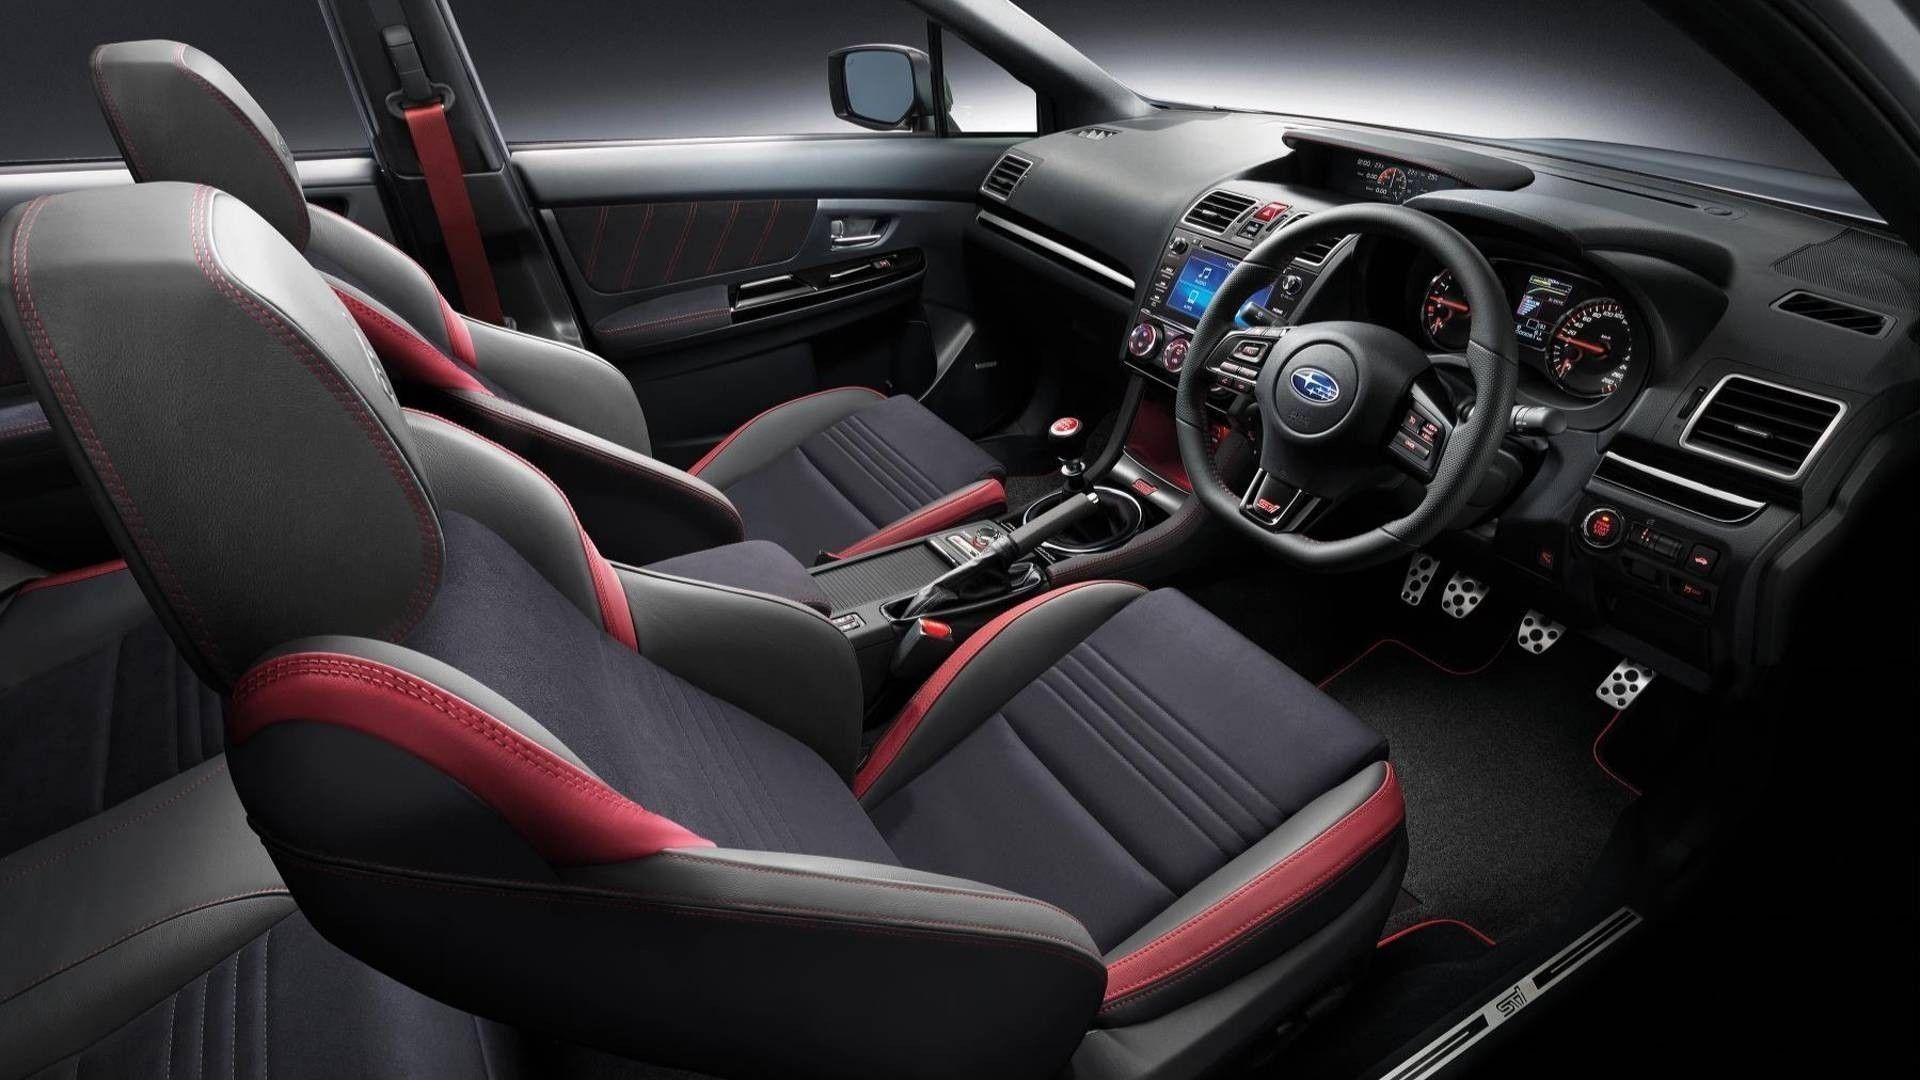 2019 Subaru Impreza WRX Sti Hatchback Picture, Release